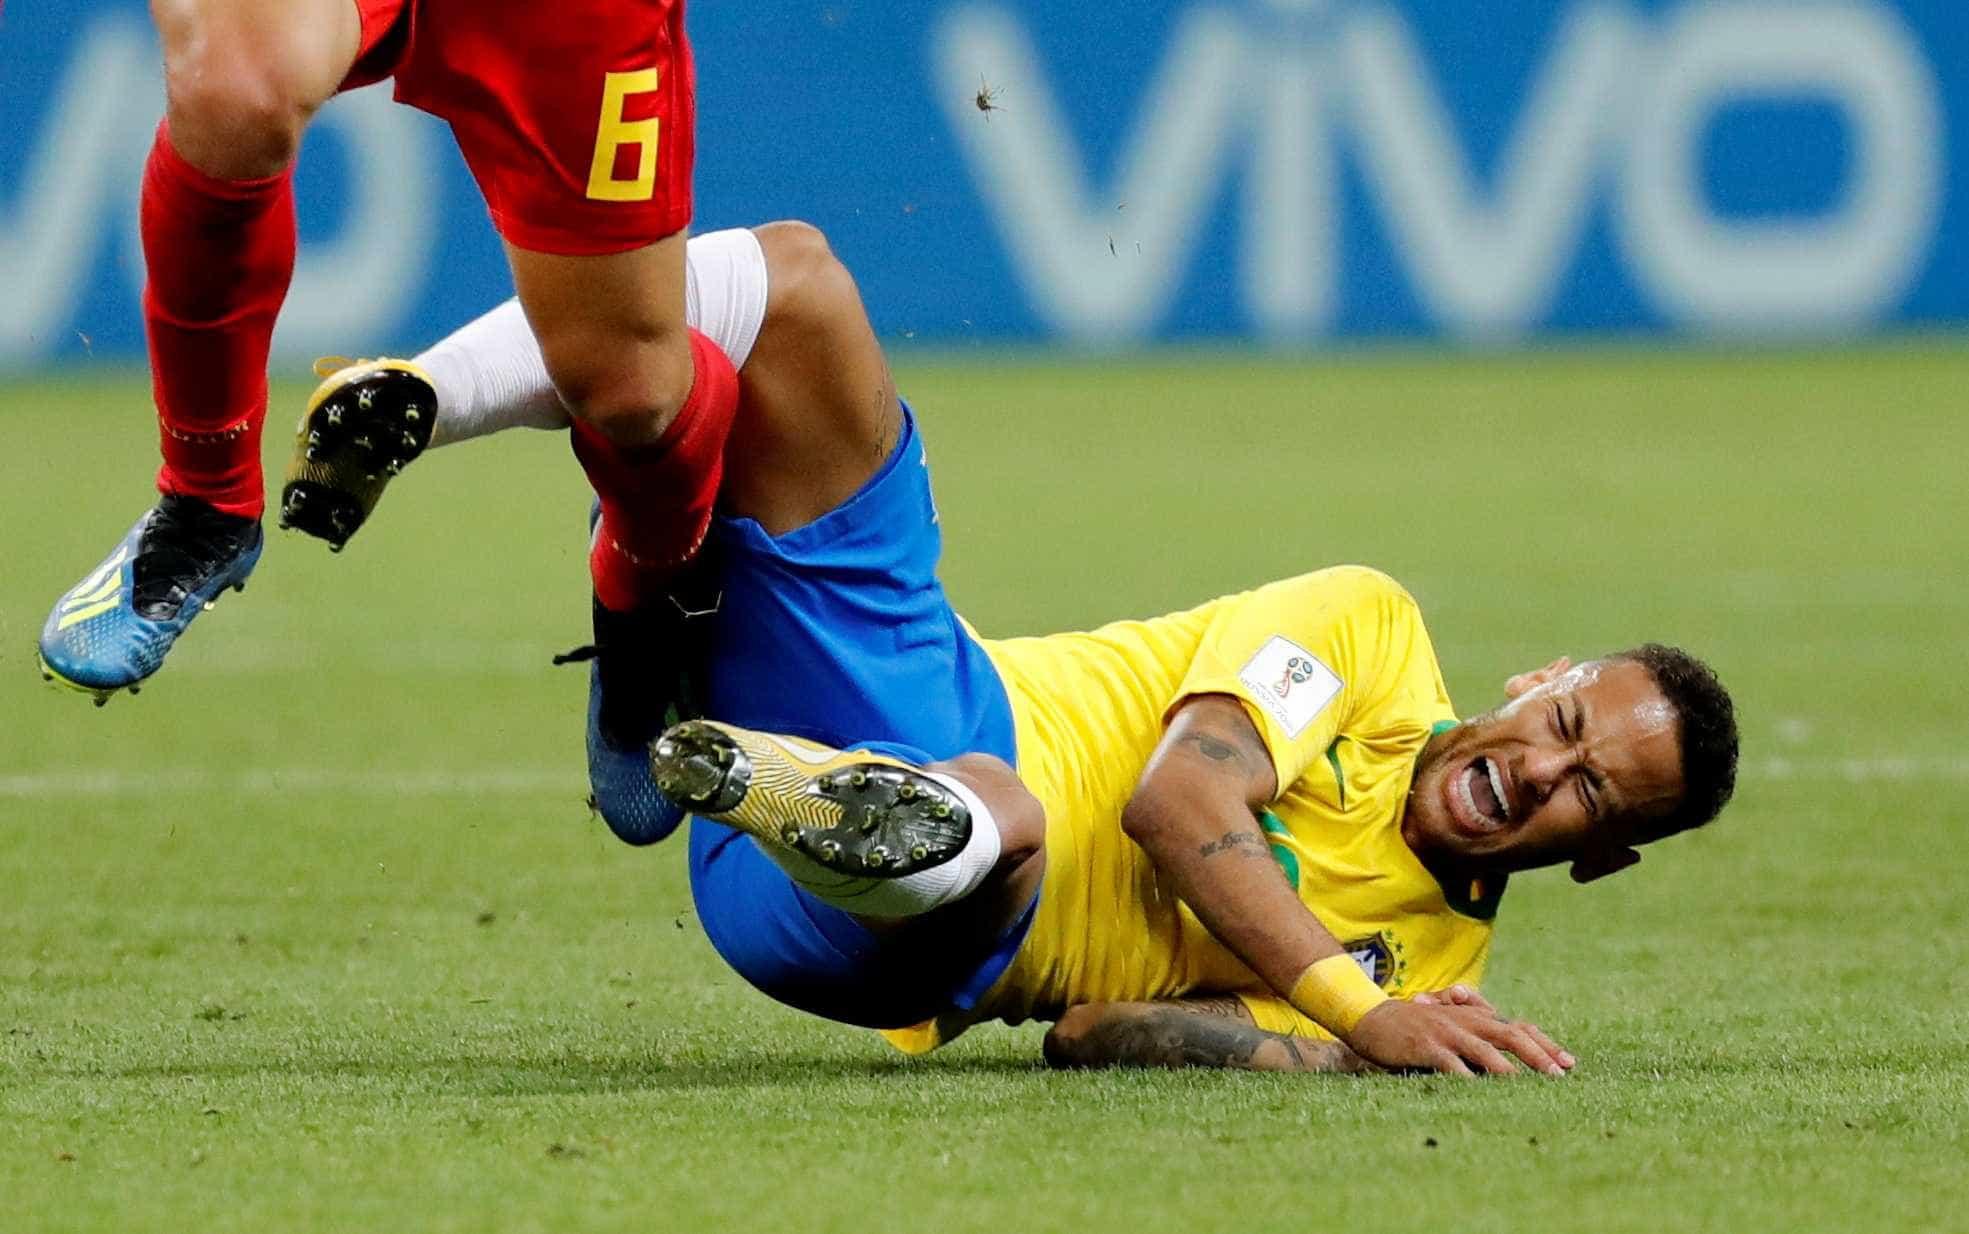 'Desafio do Neymar' viraliza na web e atacante vira chacota mundial